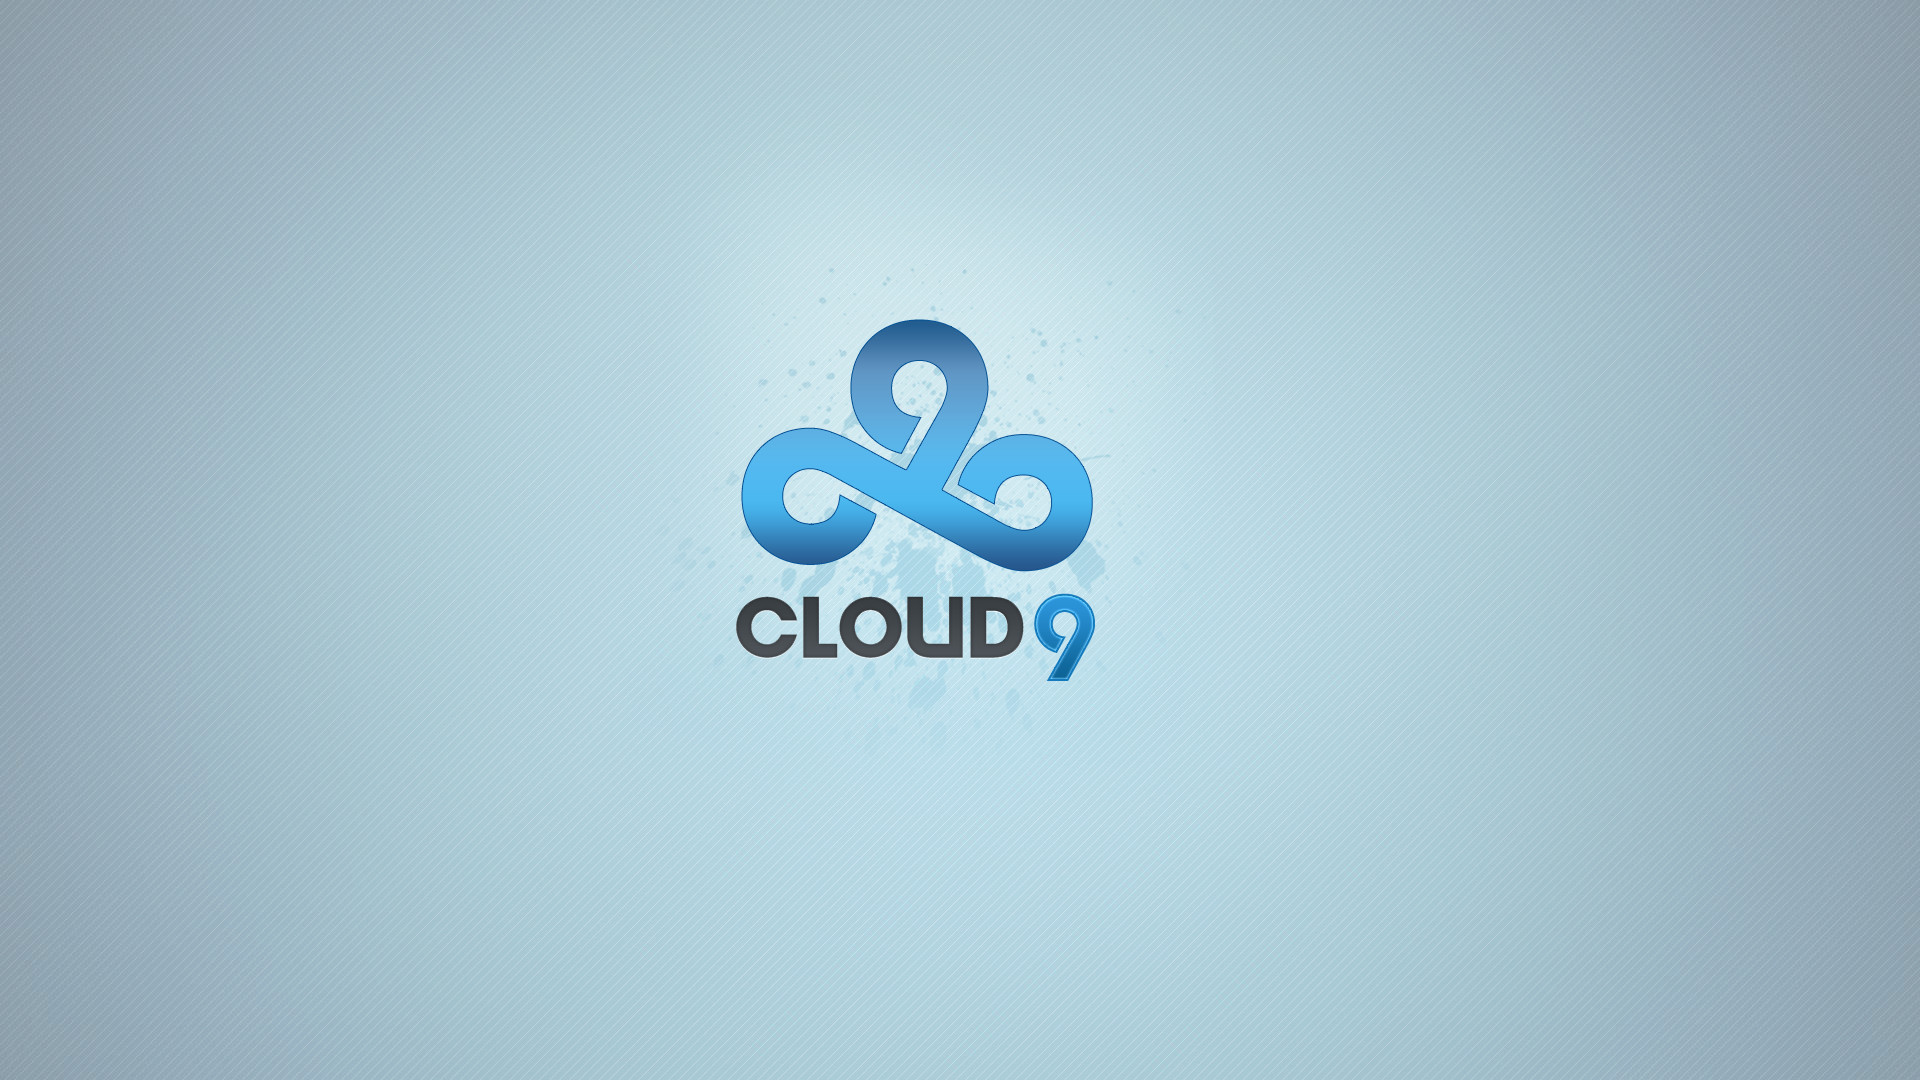 … Cloud9: https://i.imgur.com/Y2eUrc2.png …